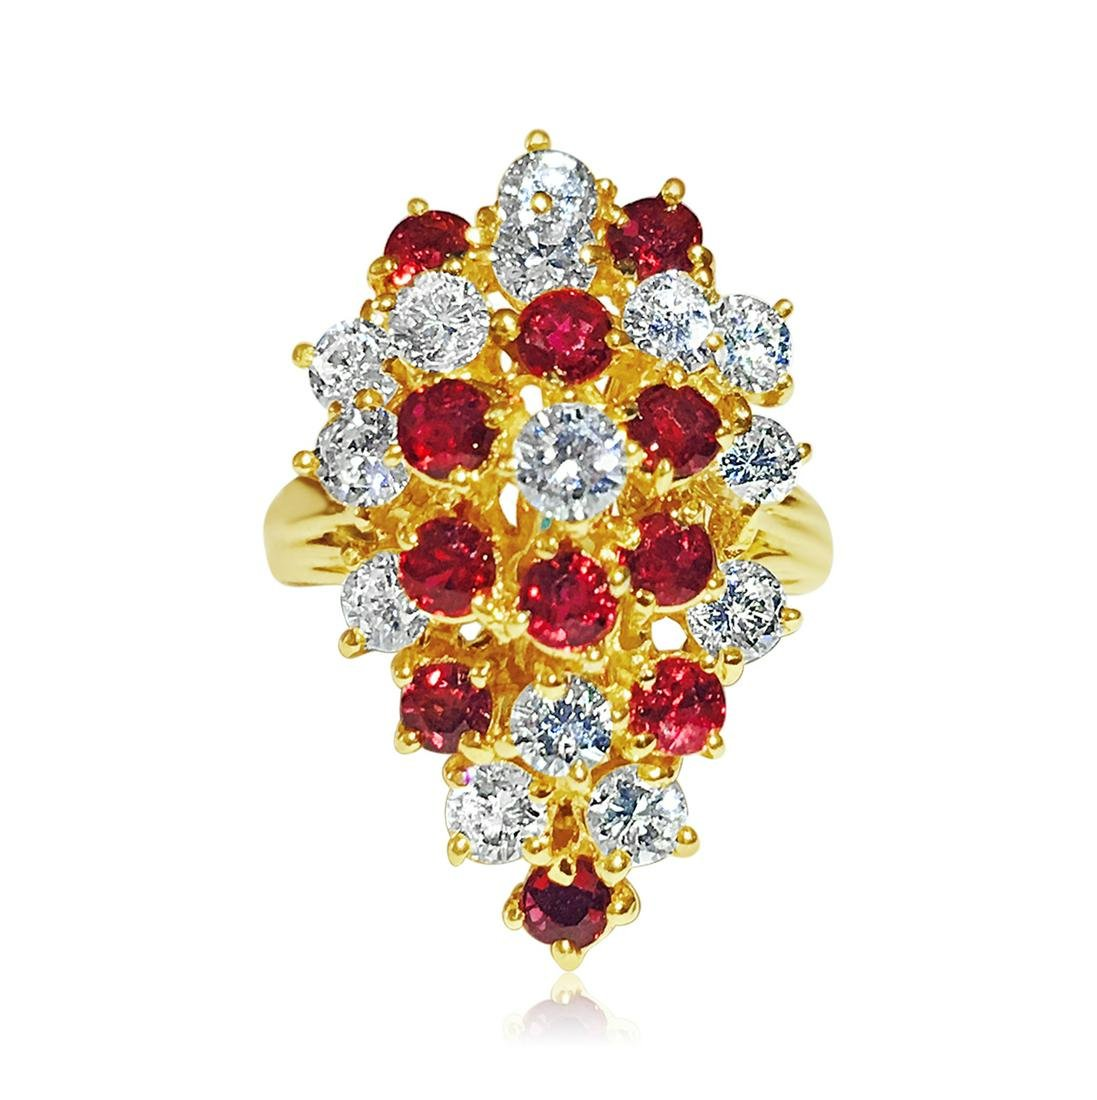 14K Gold, 3.50 Carat Diamond & Ruby Cocktail Ring